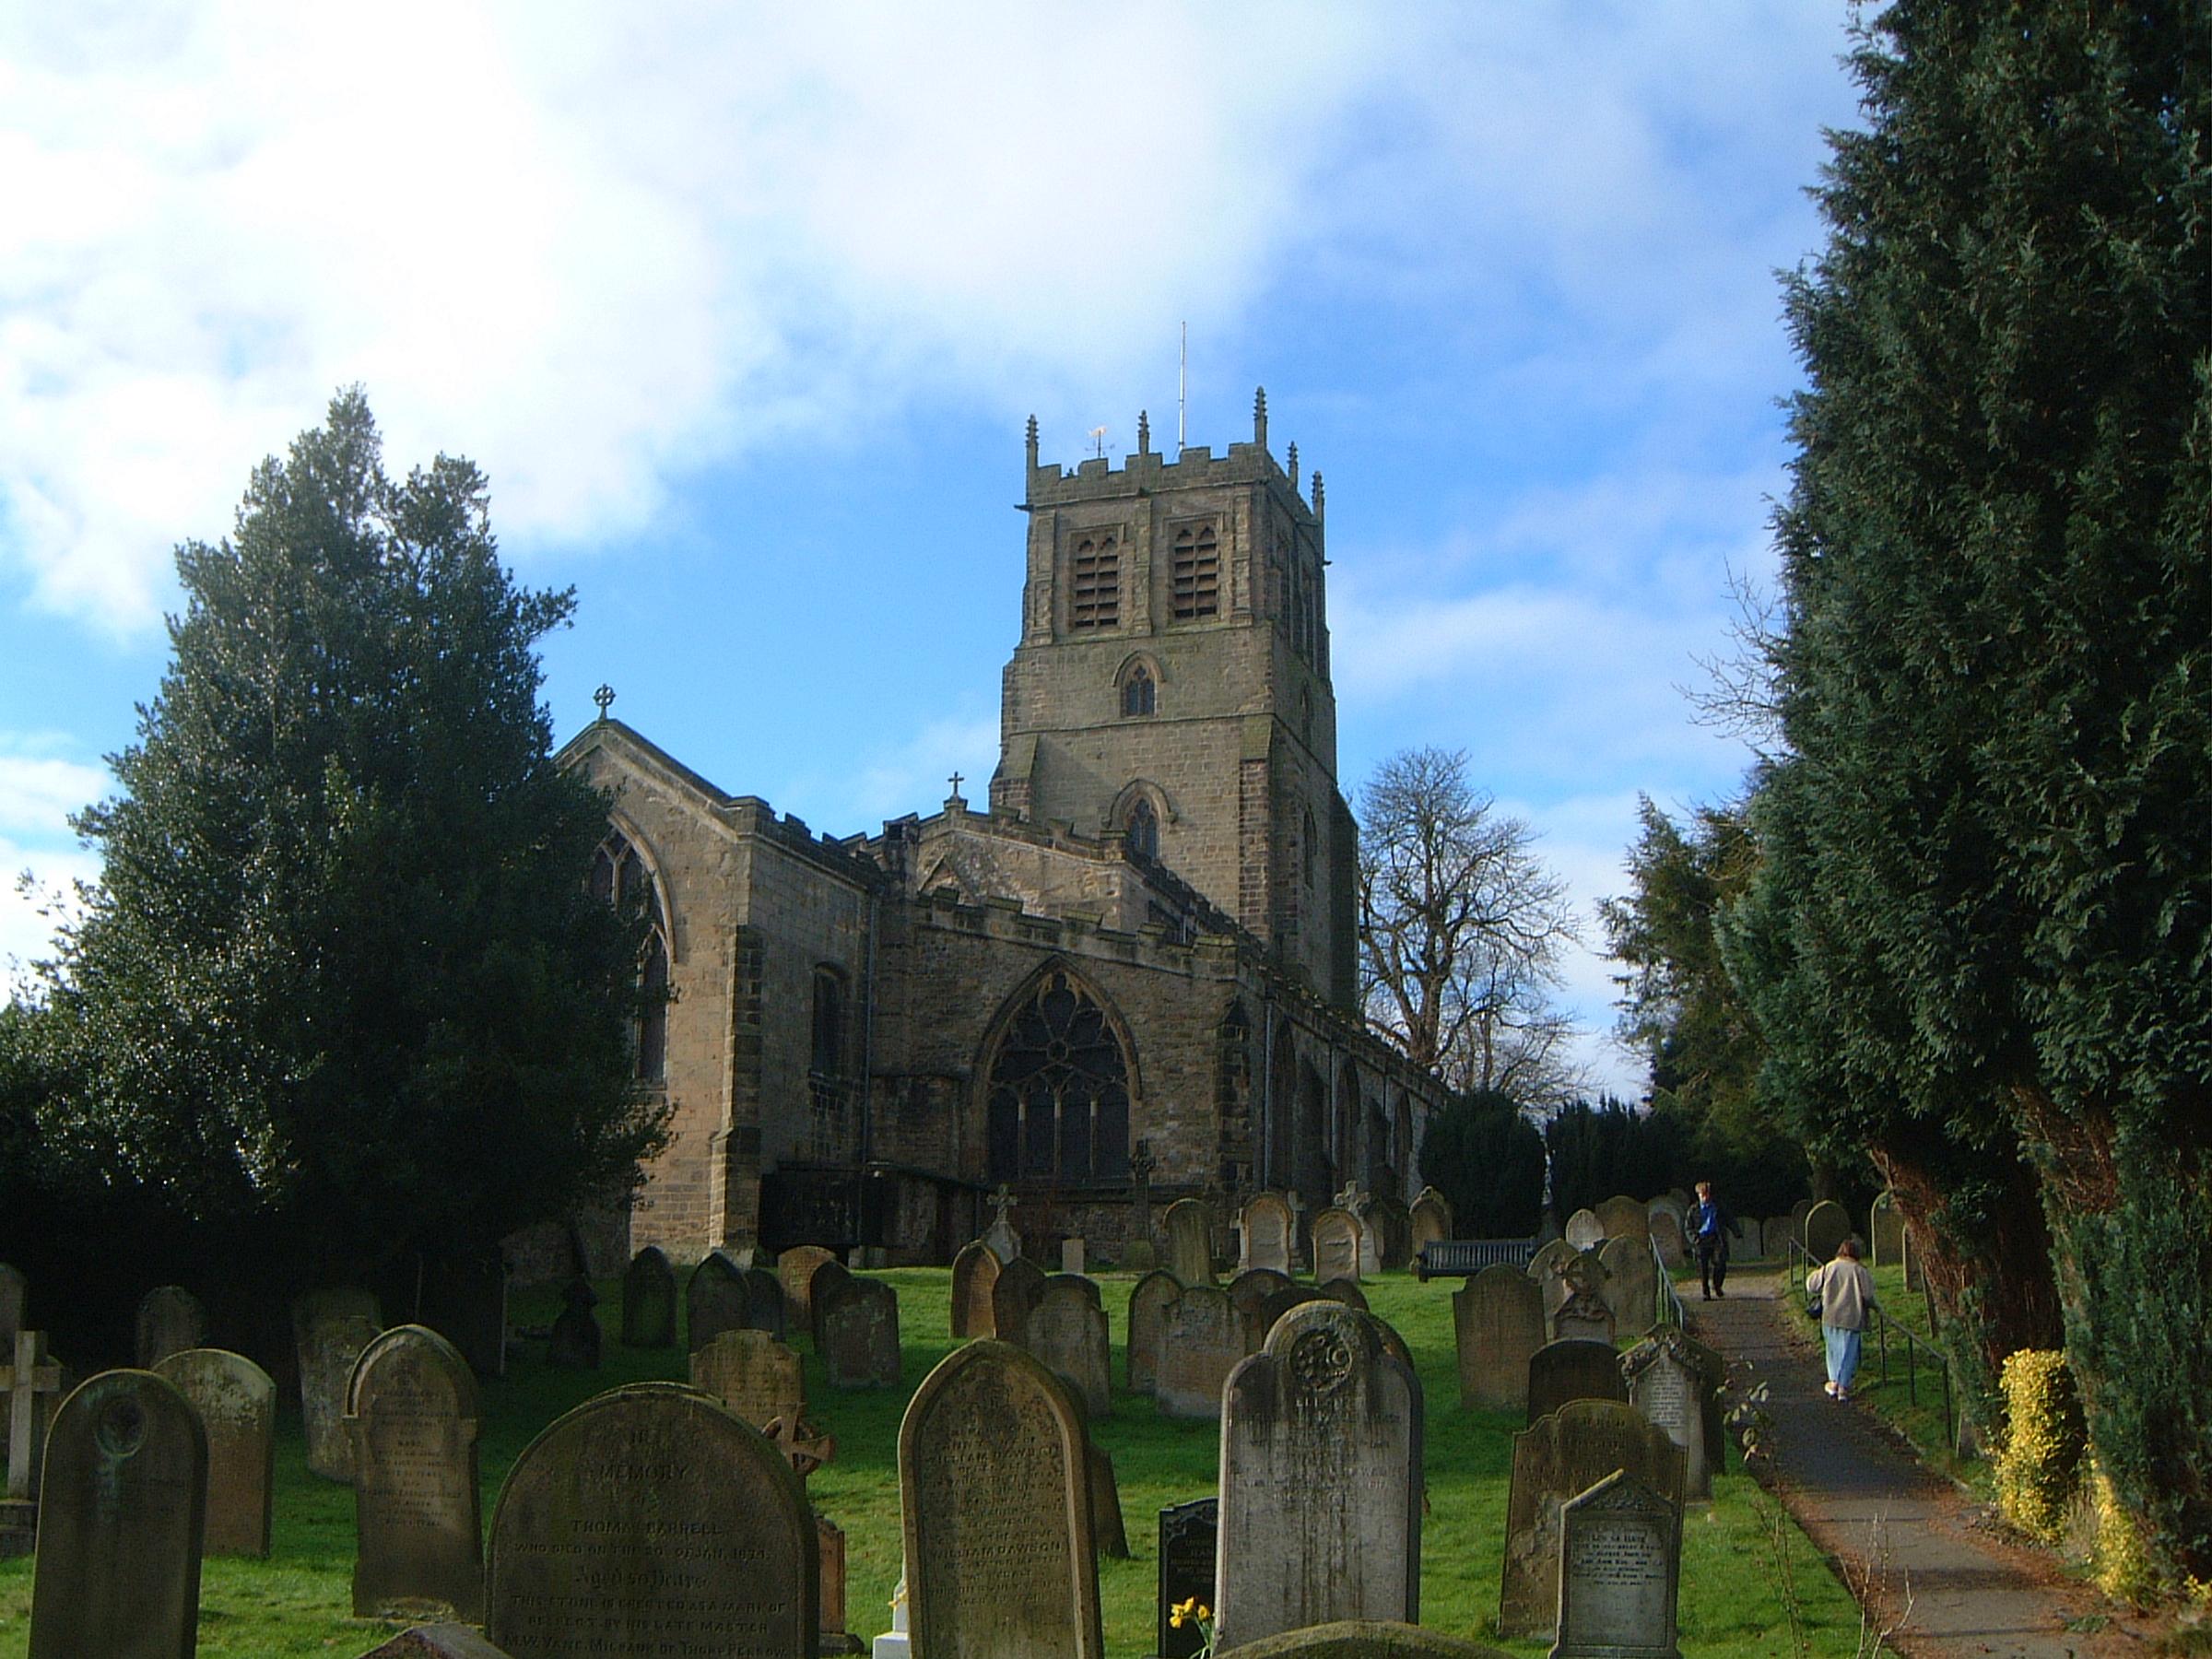 File:Bedale Church.JPG - Wikimedia Commons